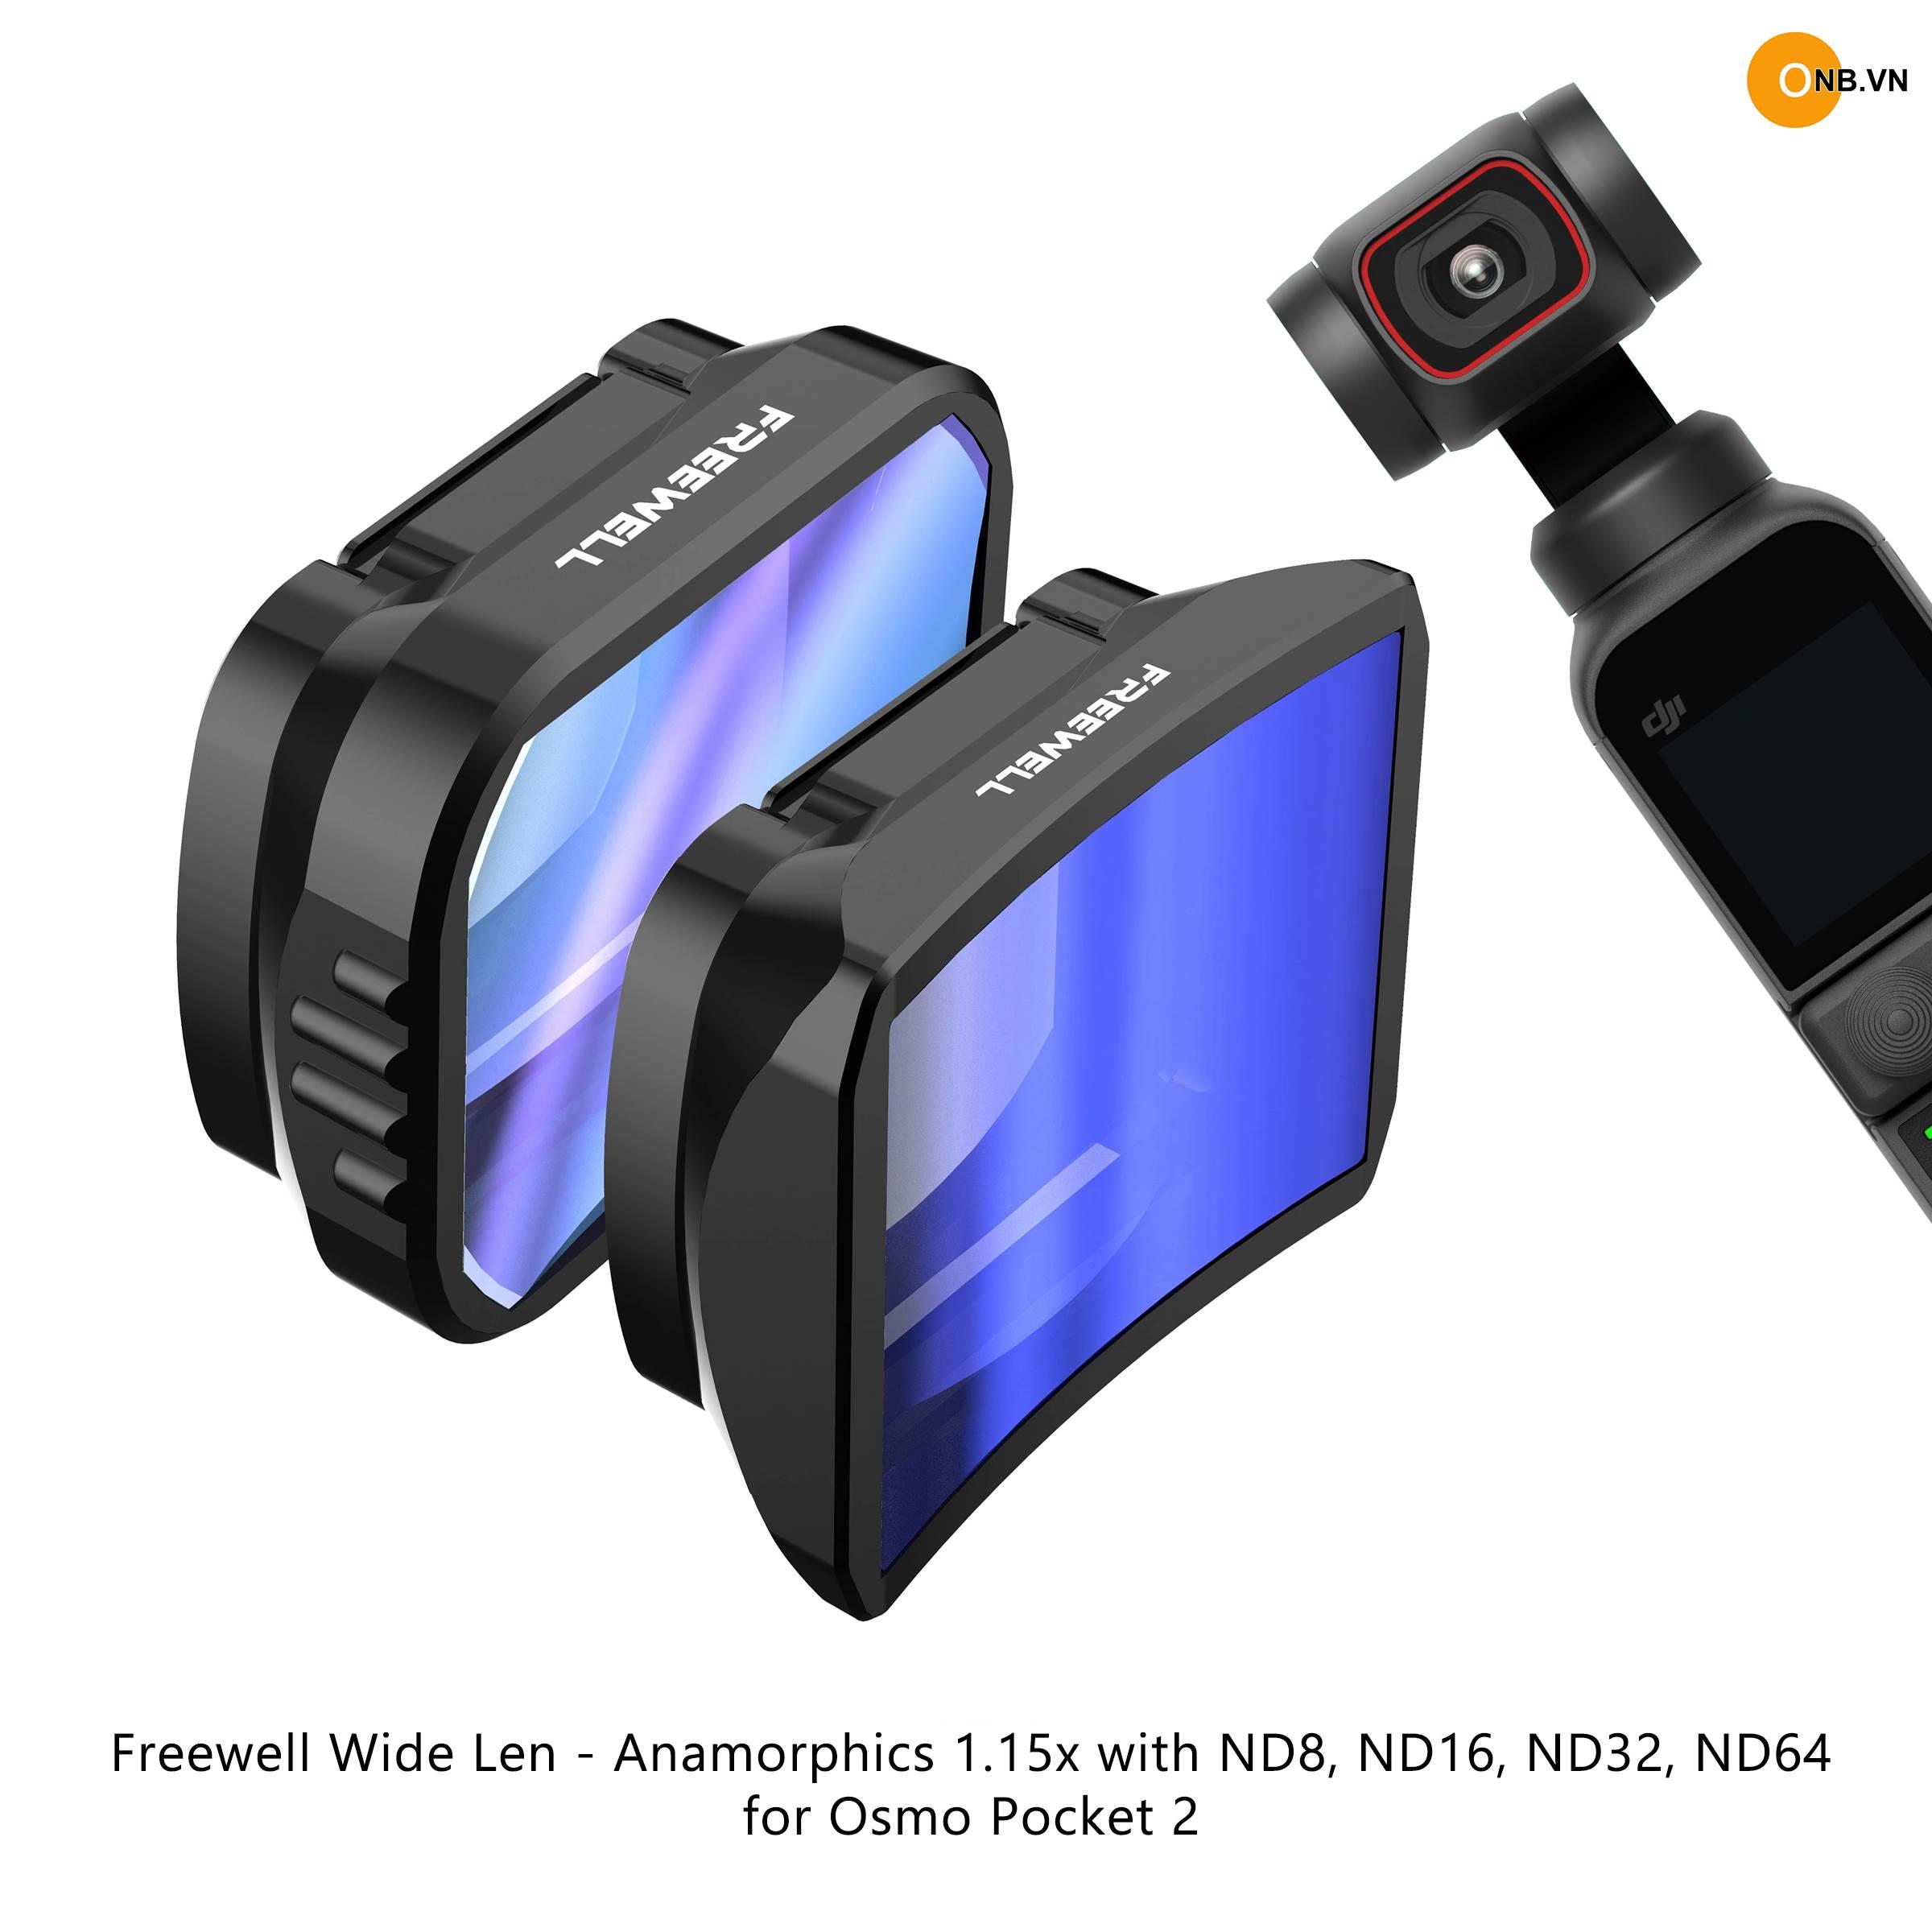 Osmo Pocket 2 Freewell Wide Len - Anamorphic 1.15x kèm ND 8/16/32/64